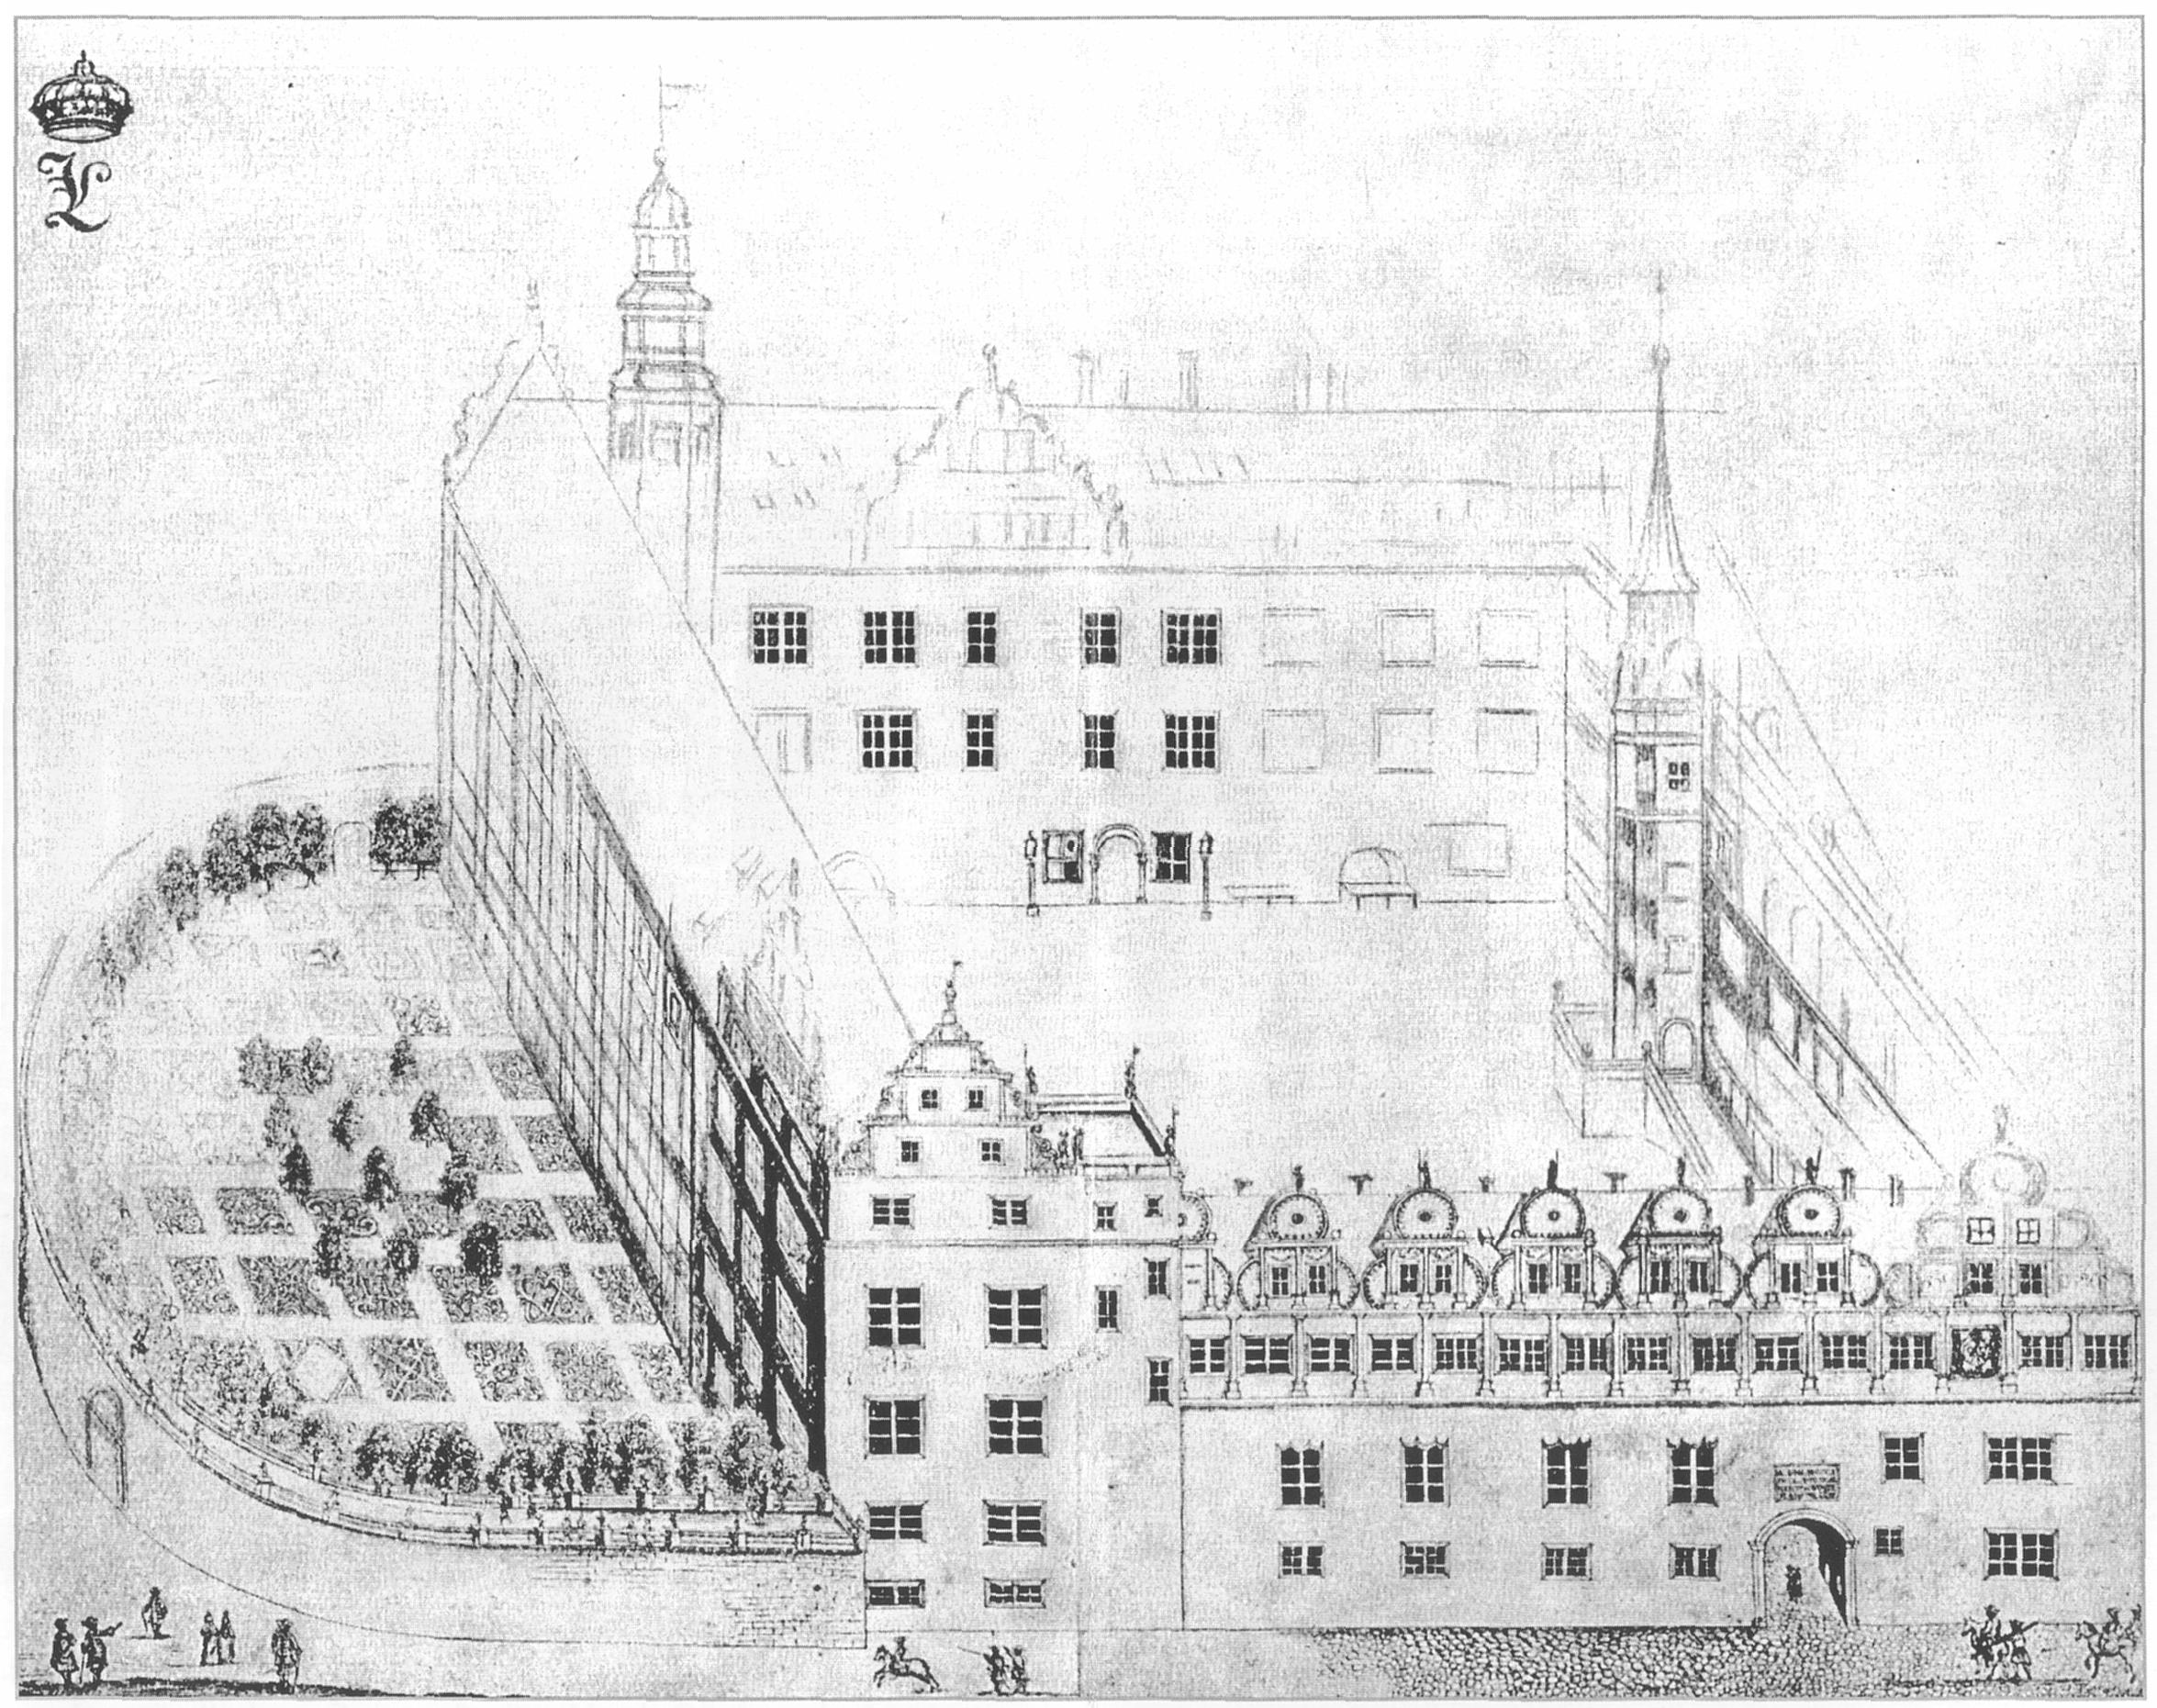 Residenzschloss in Dessau vor 1700